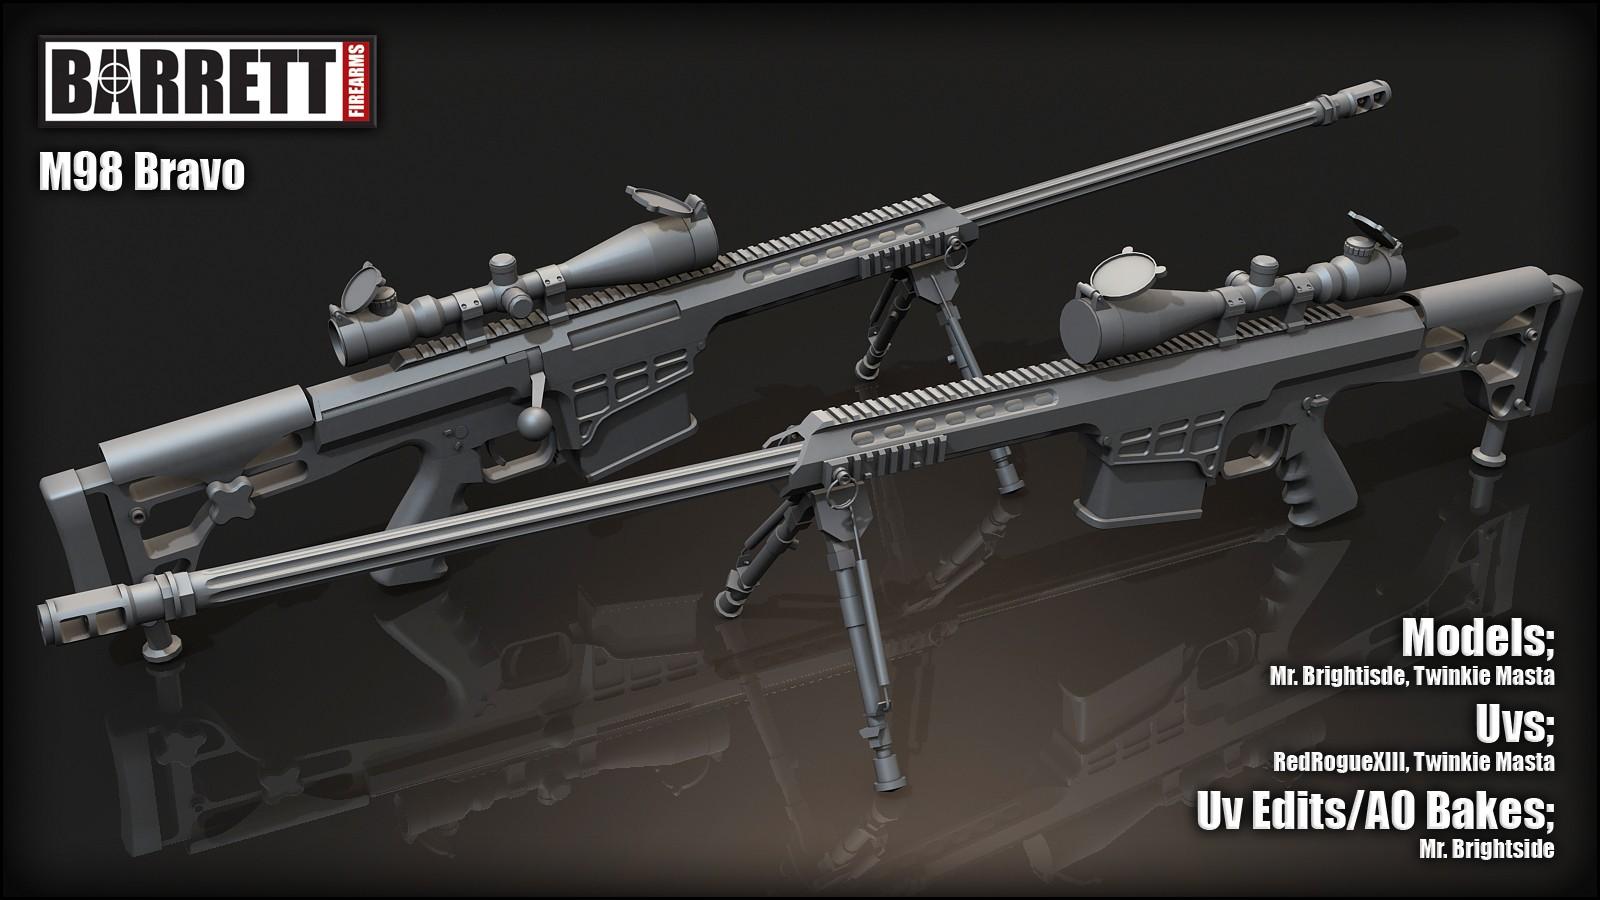 m98b sniper rifle - photo #8